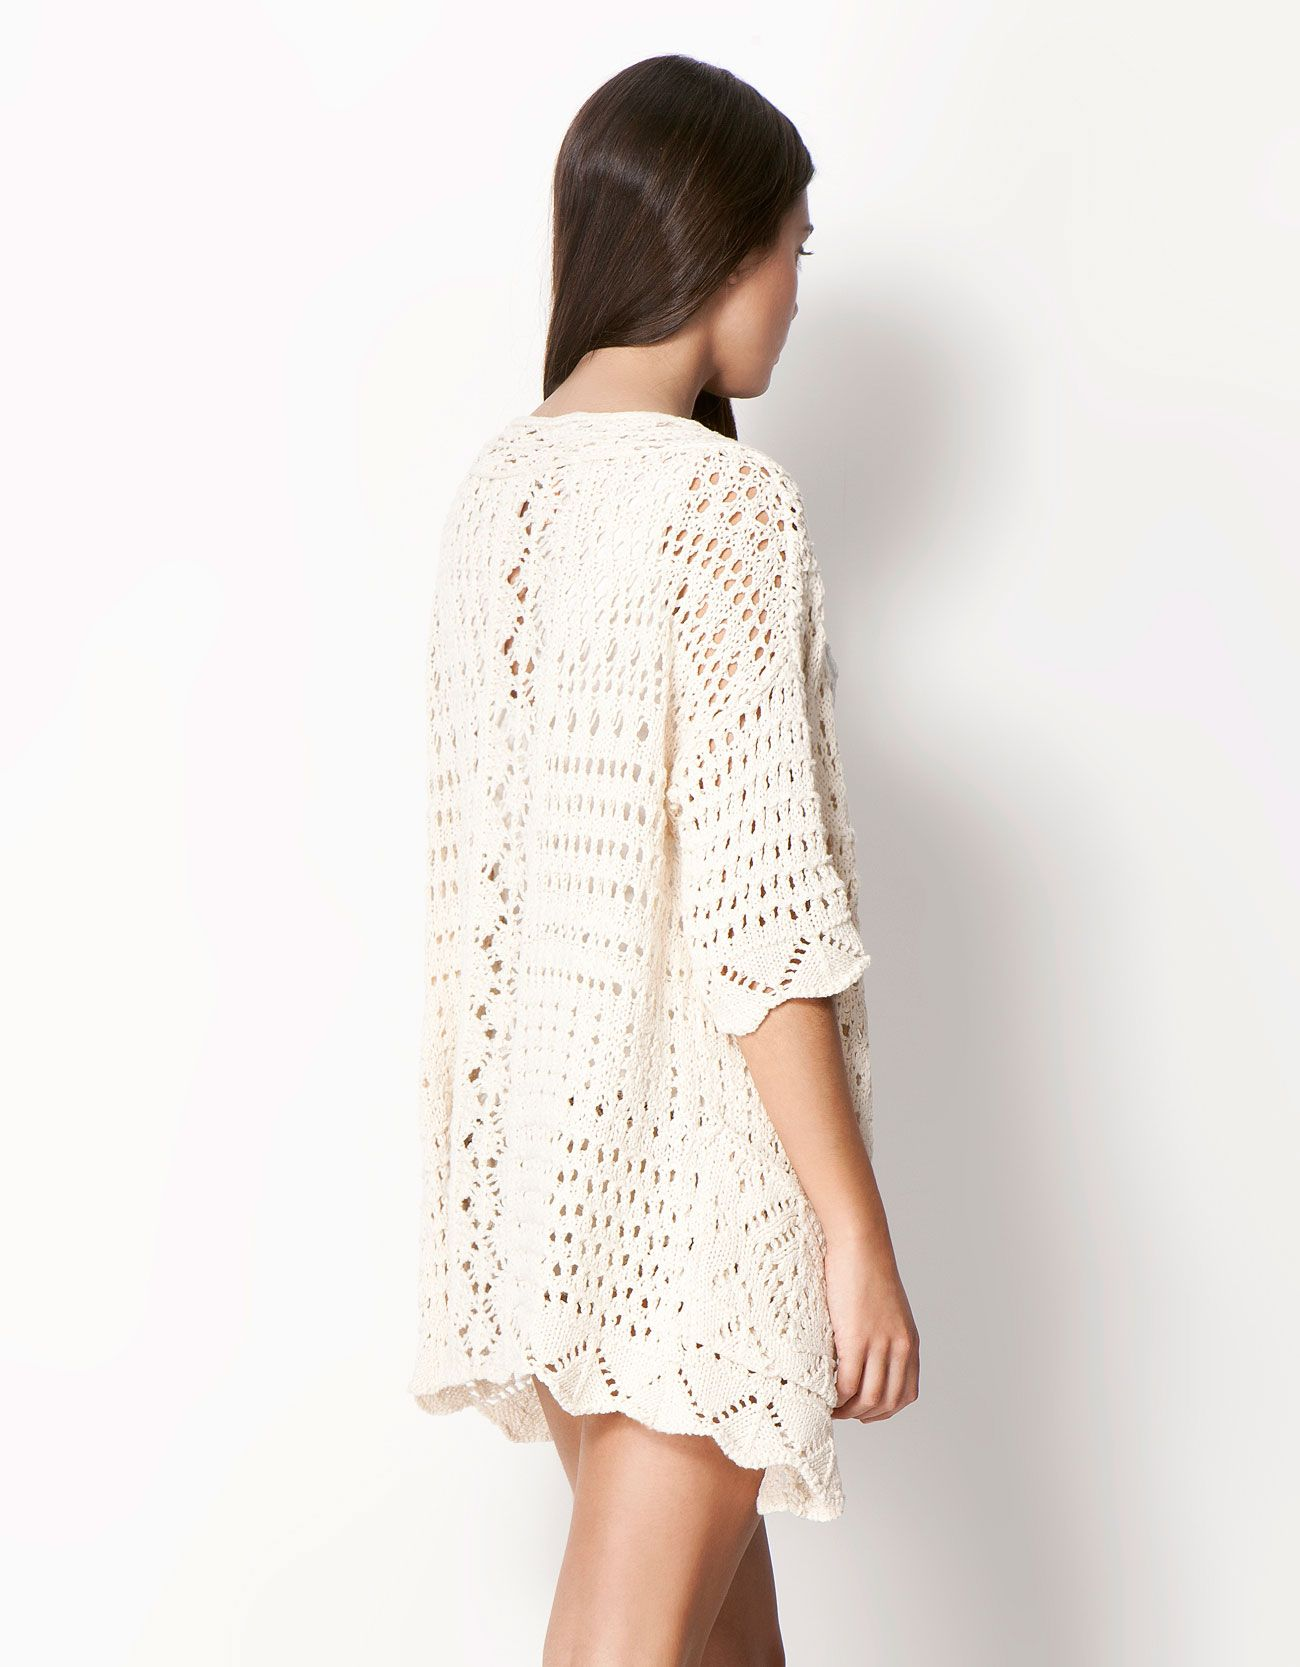 crochet jacket | cardigans.. etc | Pinterest | Bershka y Croché